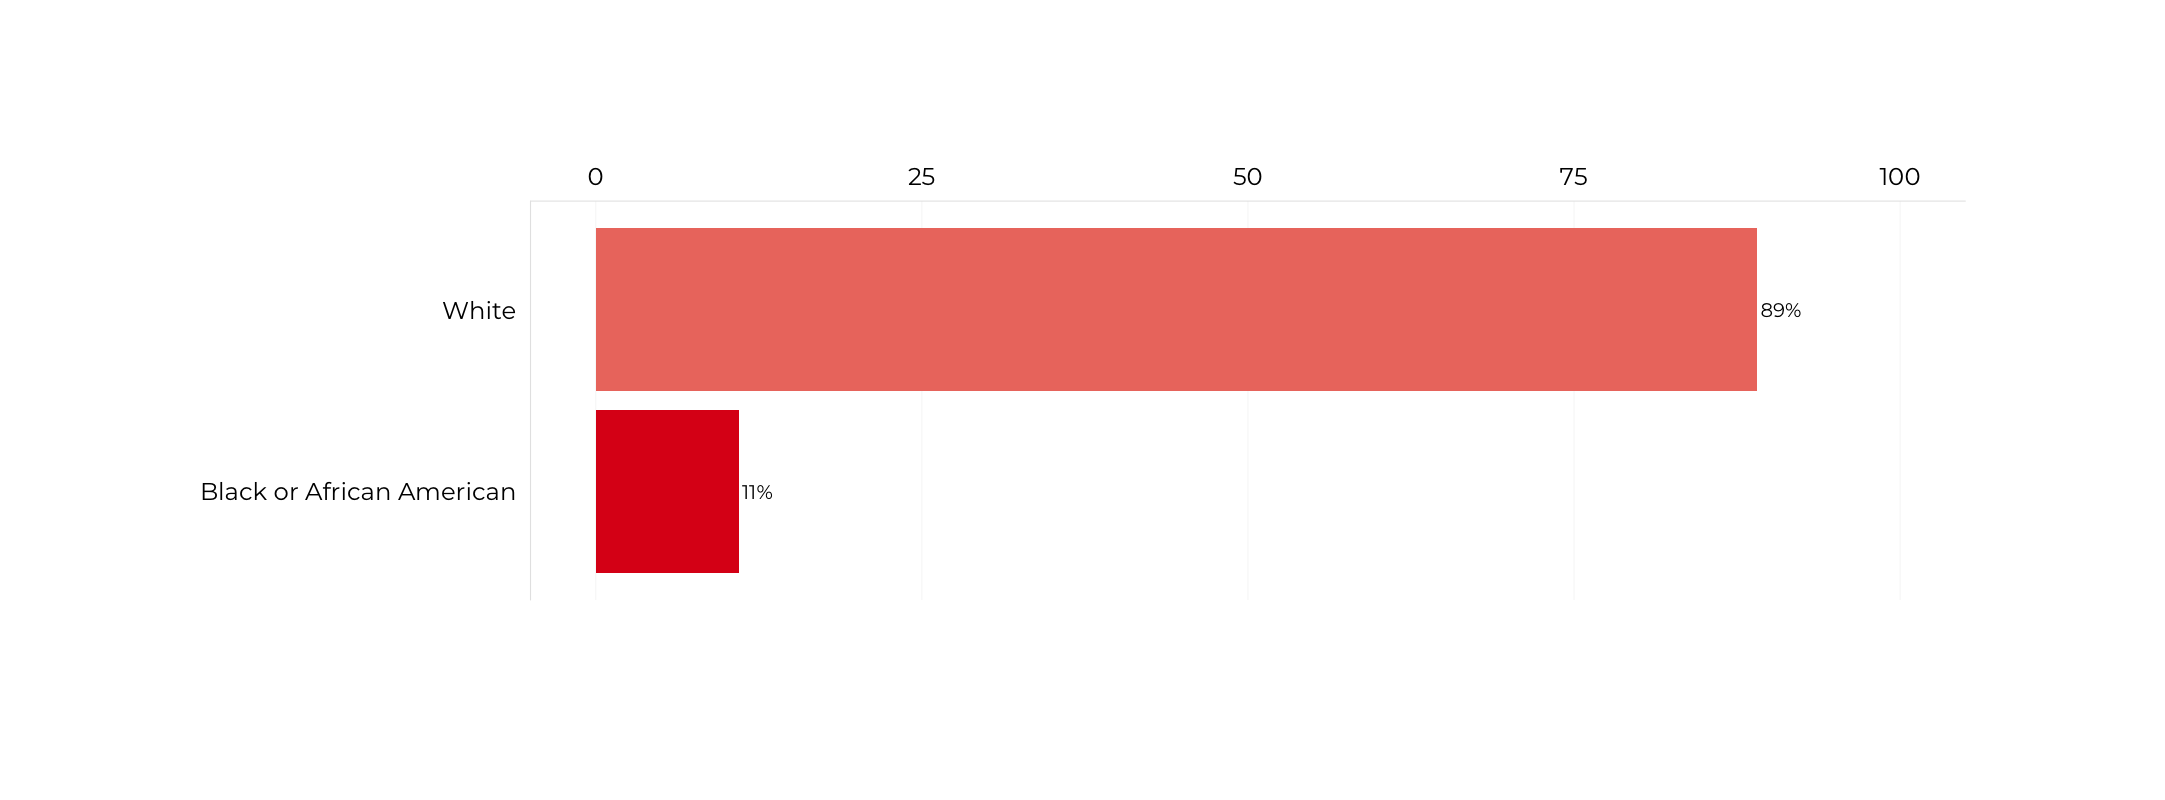 Graph about Racial Composition of Deputy Secretaries of Veterans Affairs. More detailed text description below.